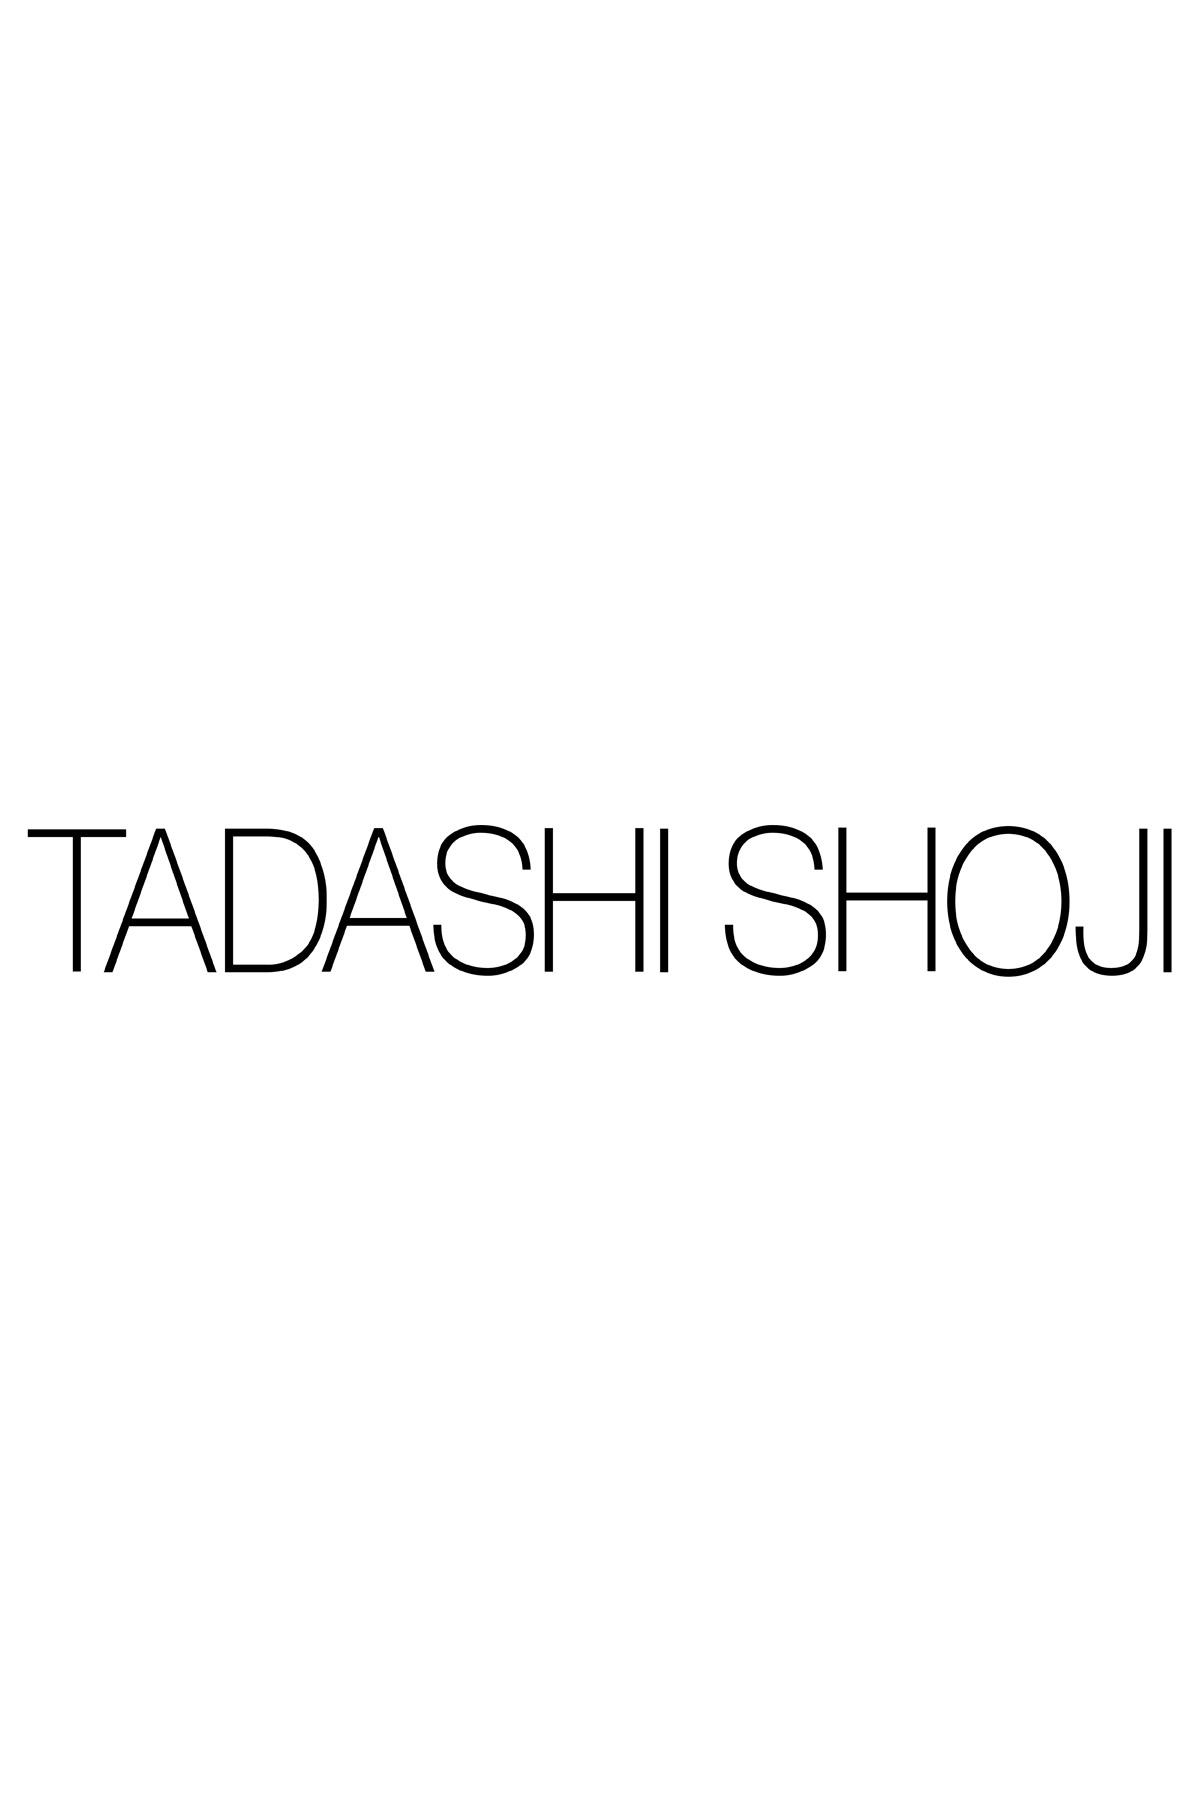 Tadashi Shoji x Bel Aire Bridal - Pearl and Rhinestone Garland with Ties